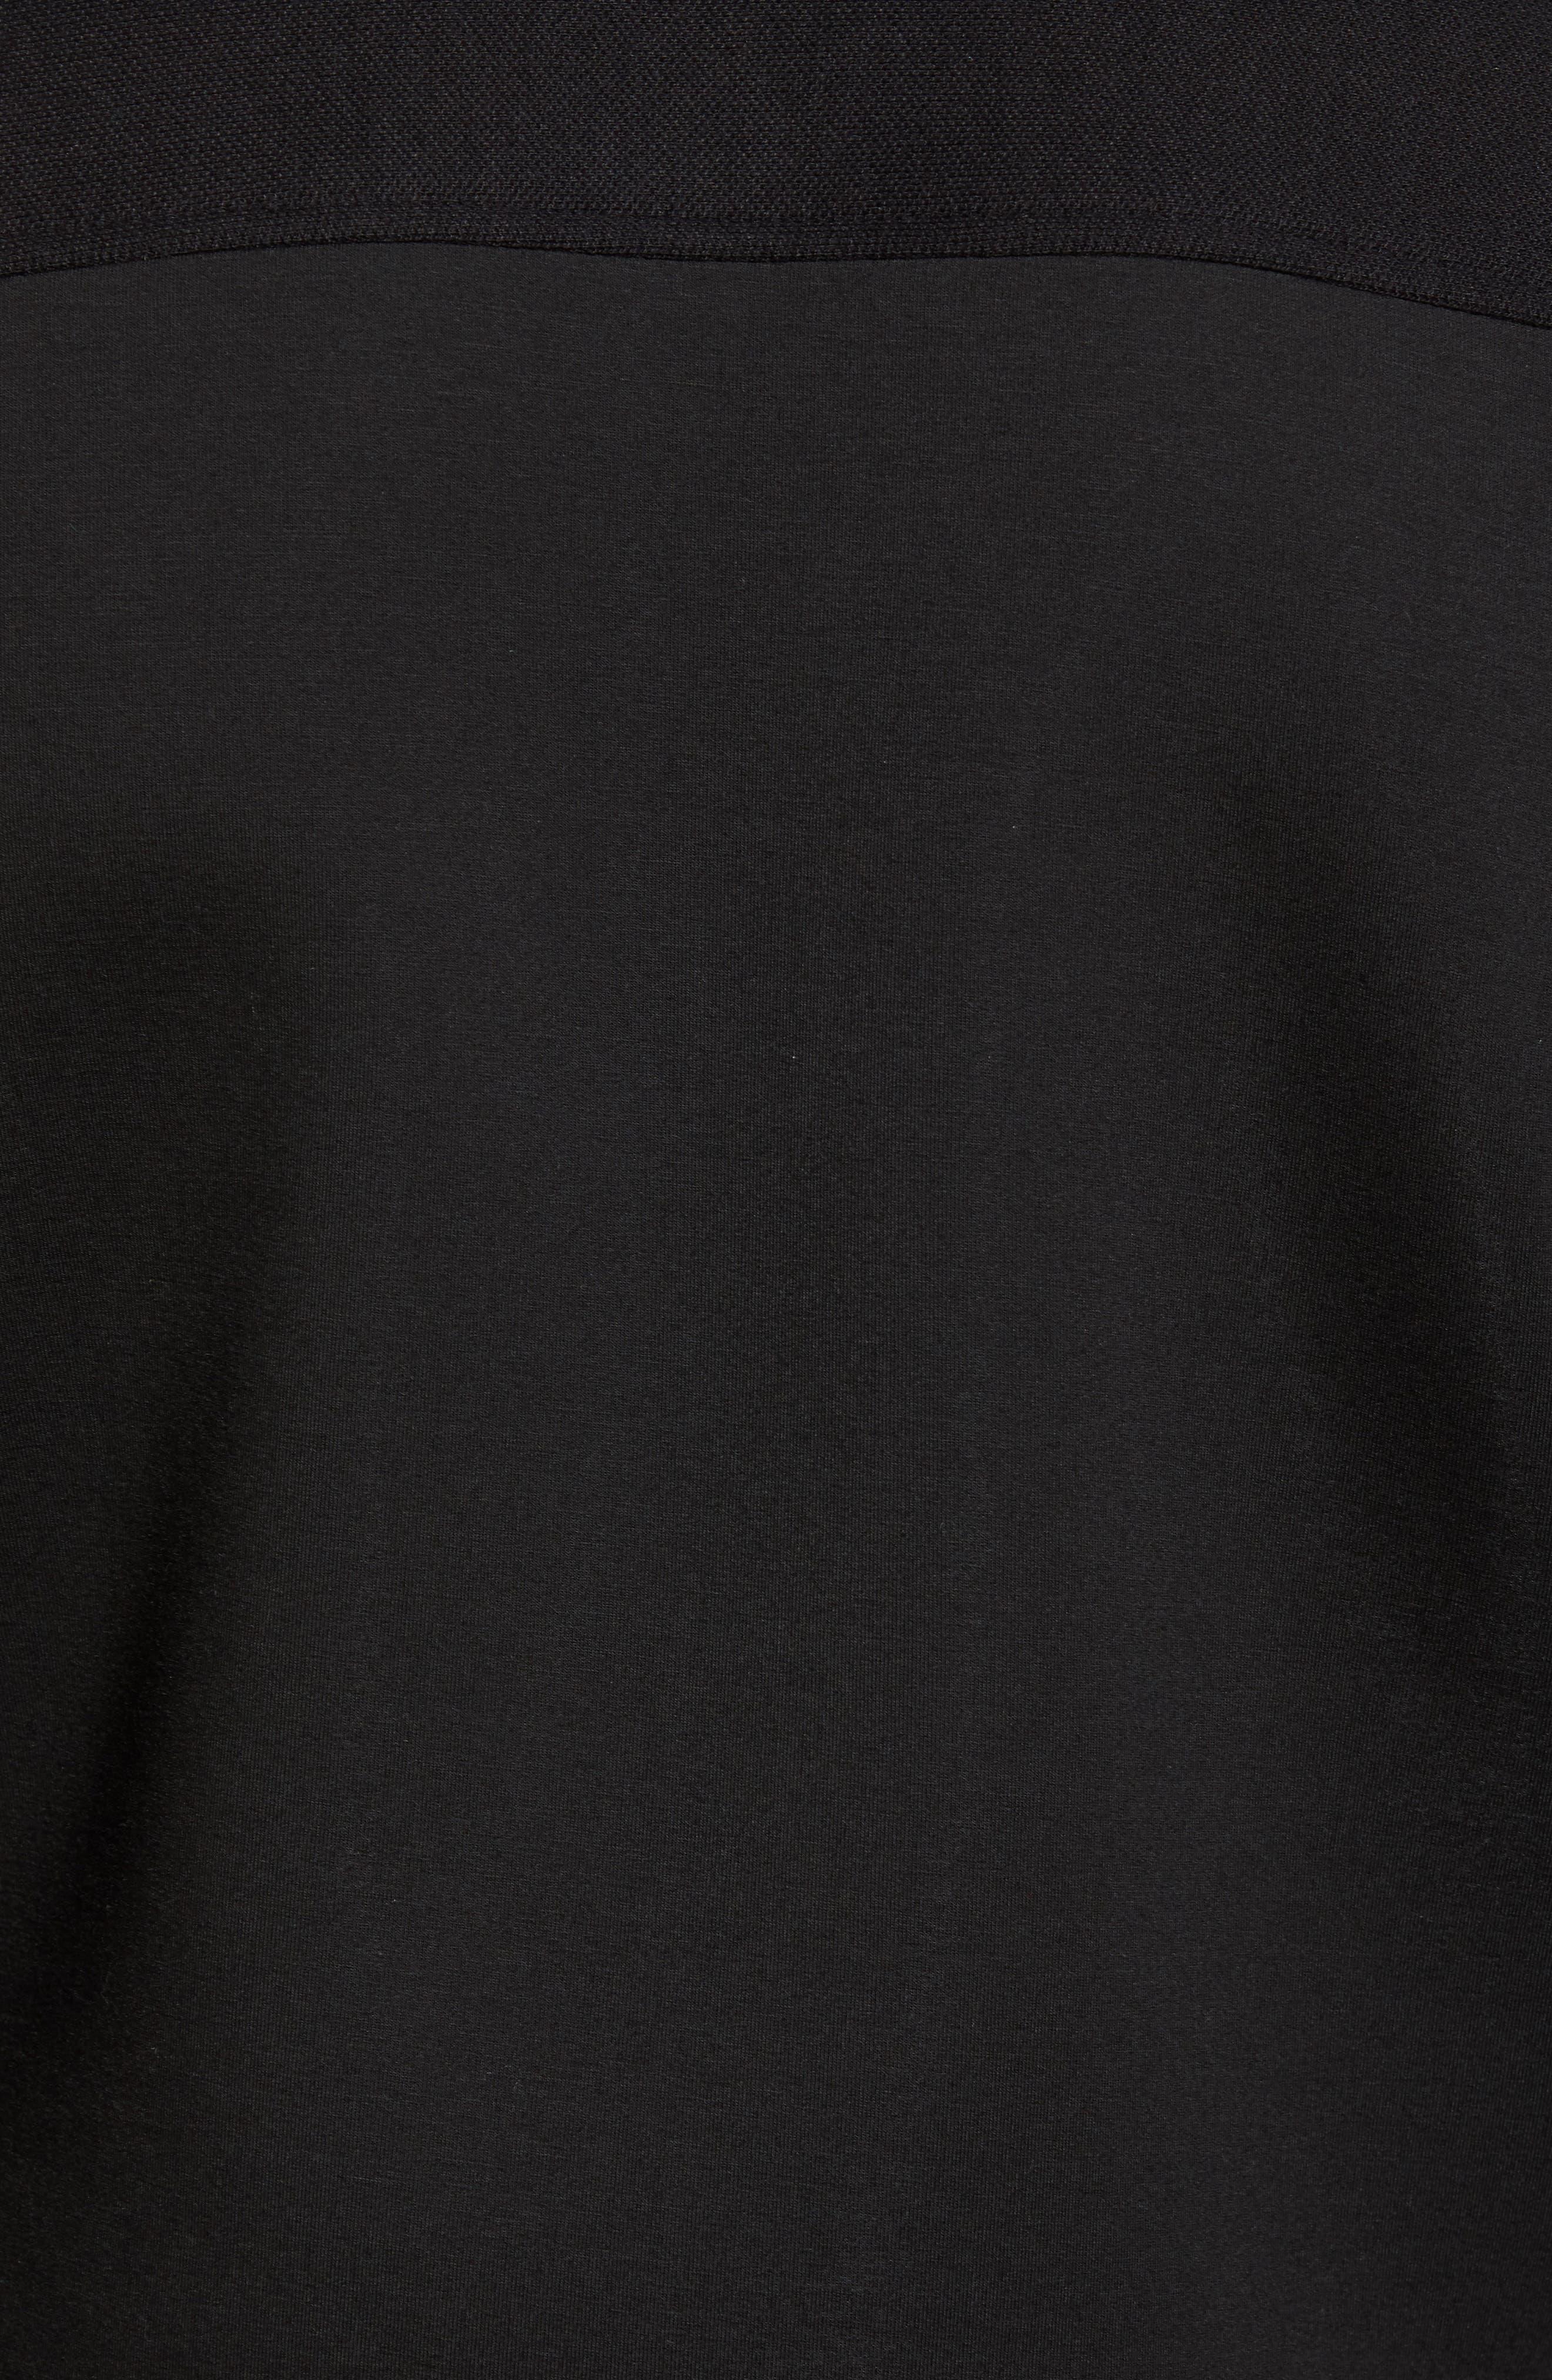 Outme Trim Textured Bomber,                             Alternate thumbnail 5, color,                             Black